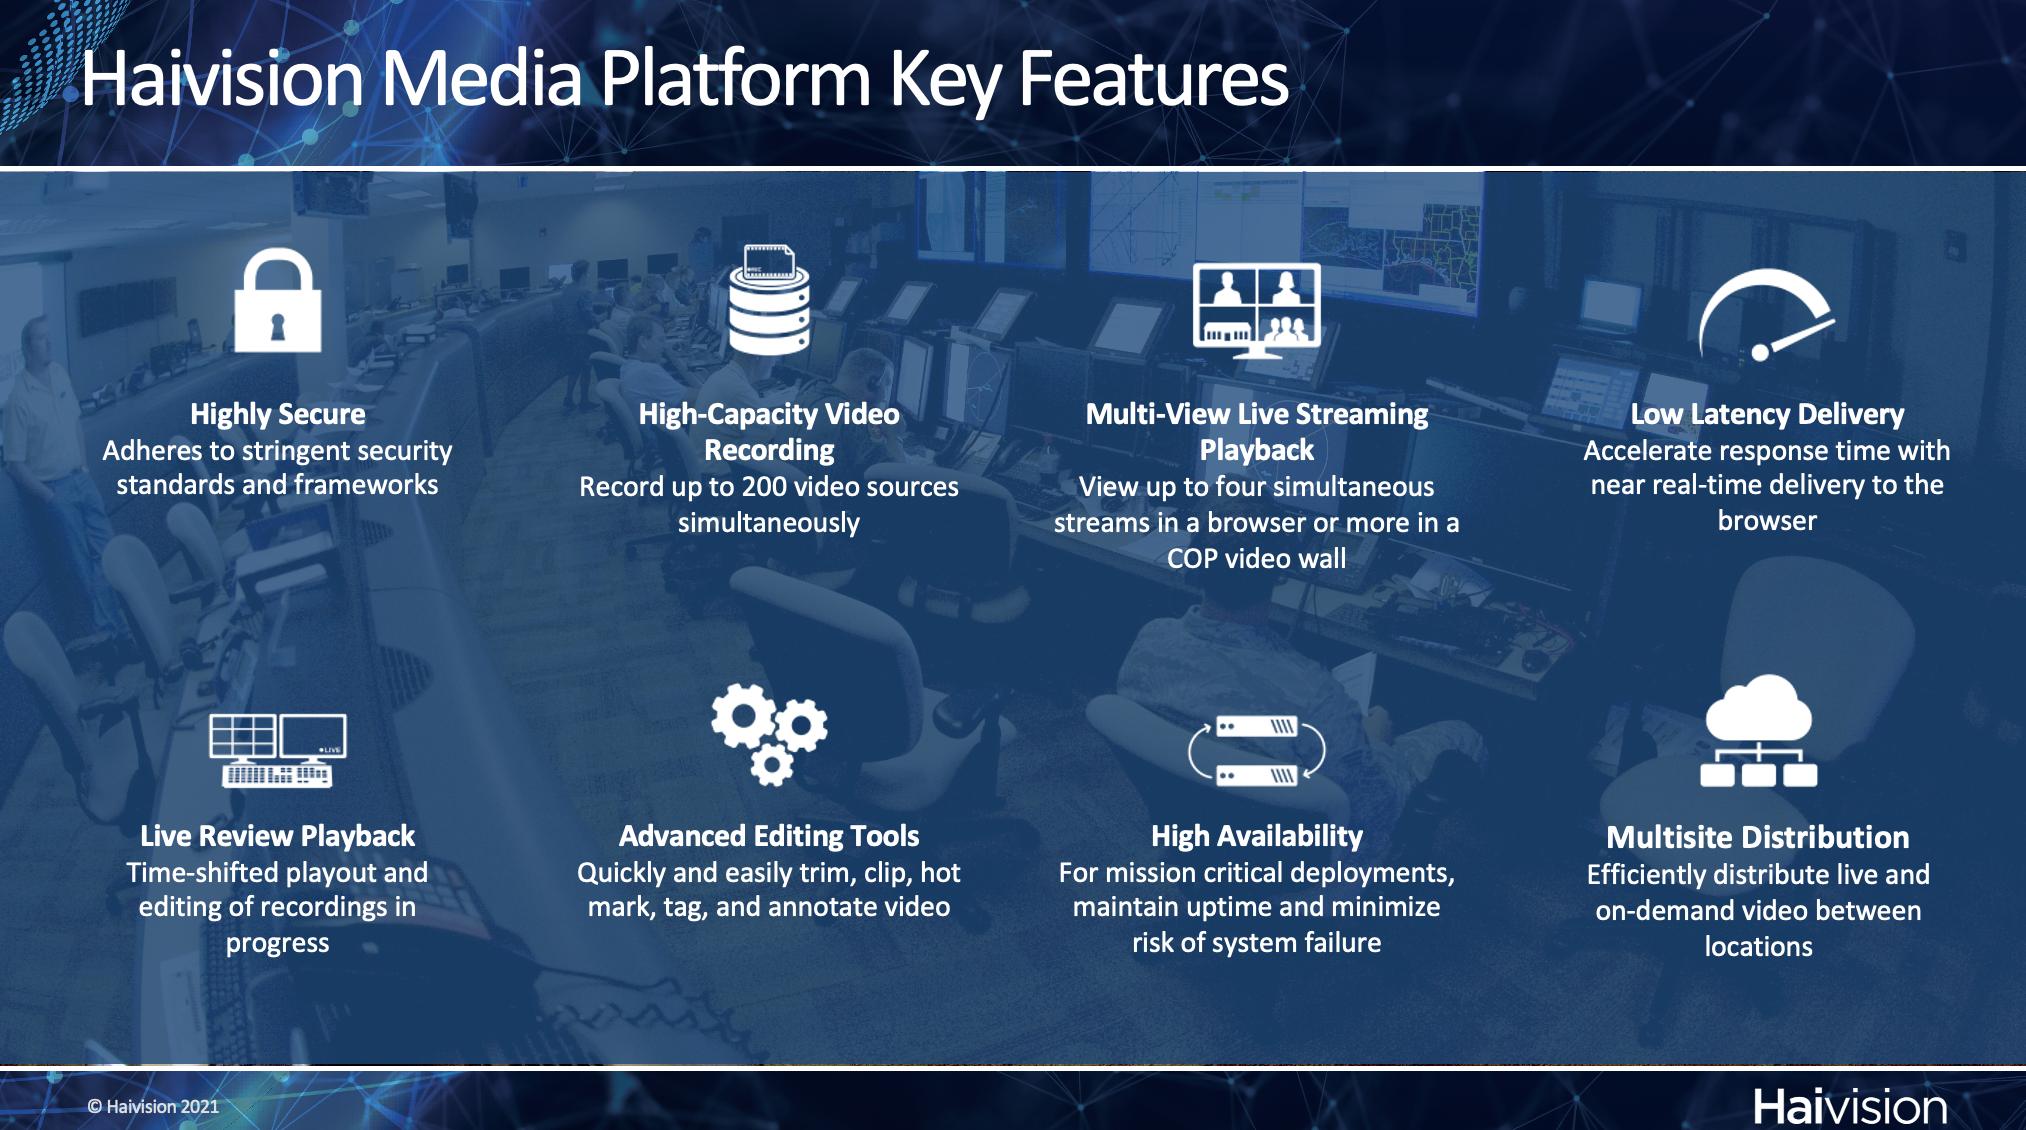 Haivision Media Platform Key Features